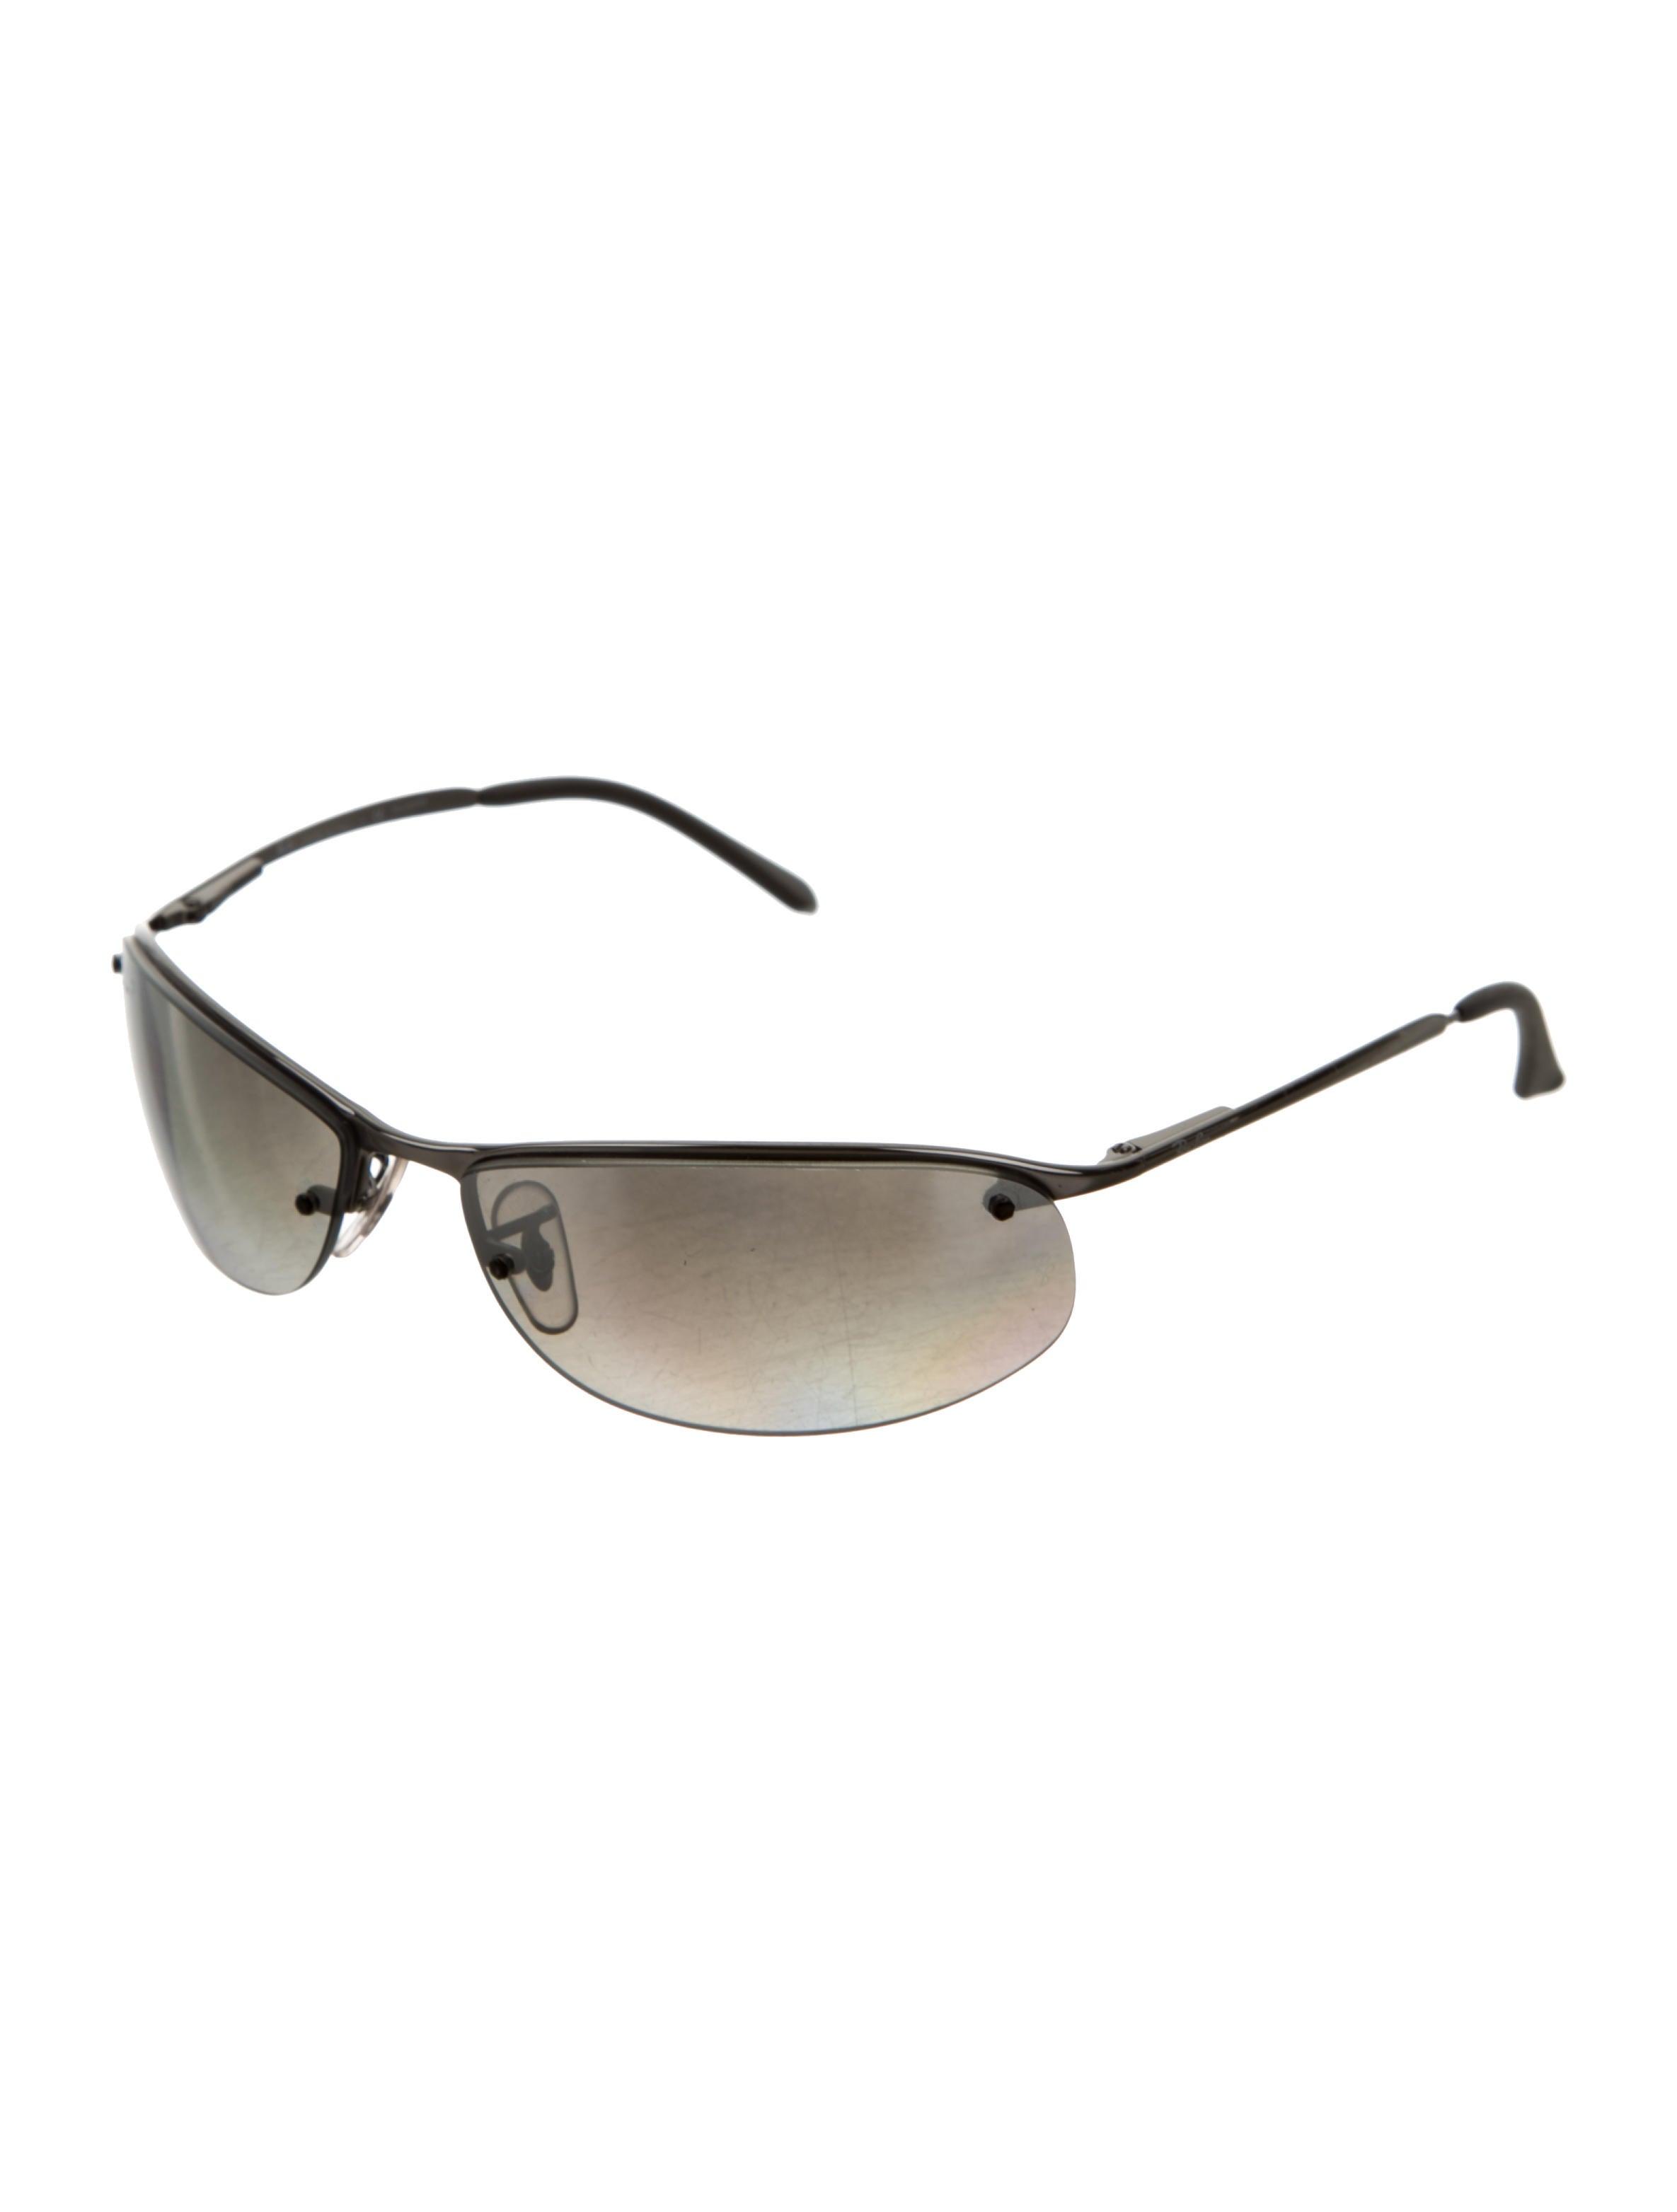 Rimless Polarized Sunglasses : Ray-Ban Polarized Rimless Sunglasses - Accessories ...